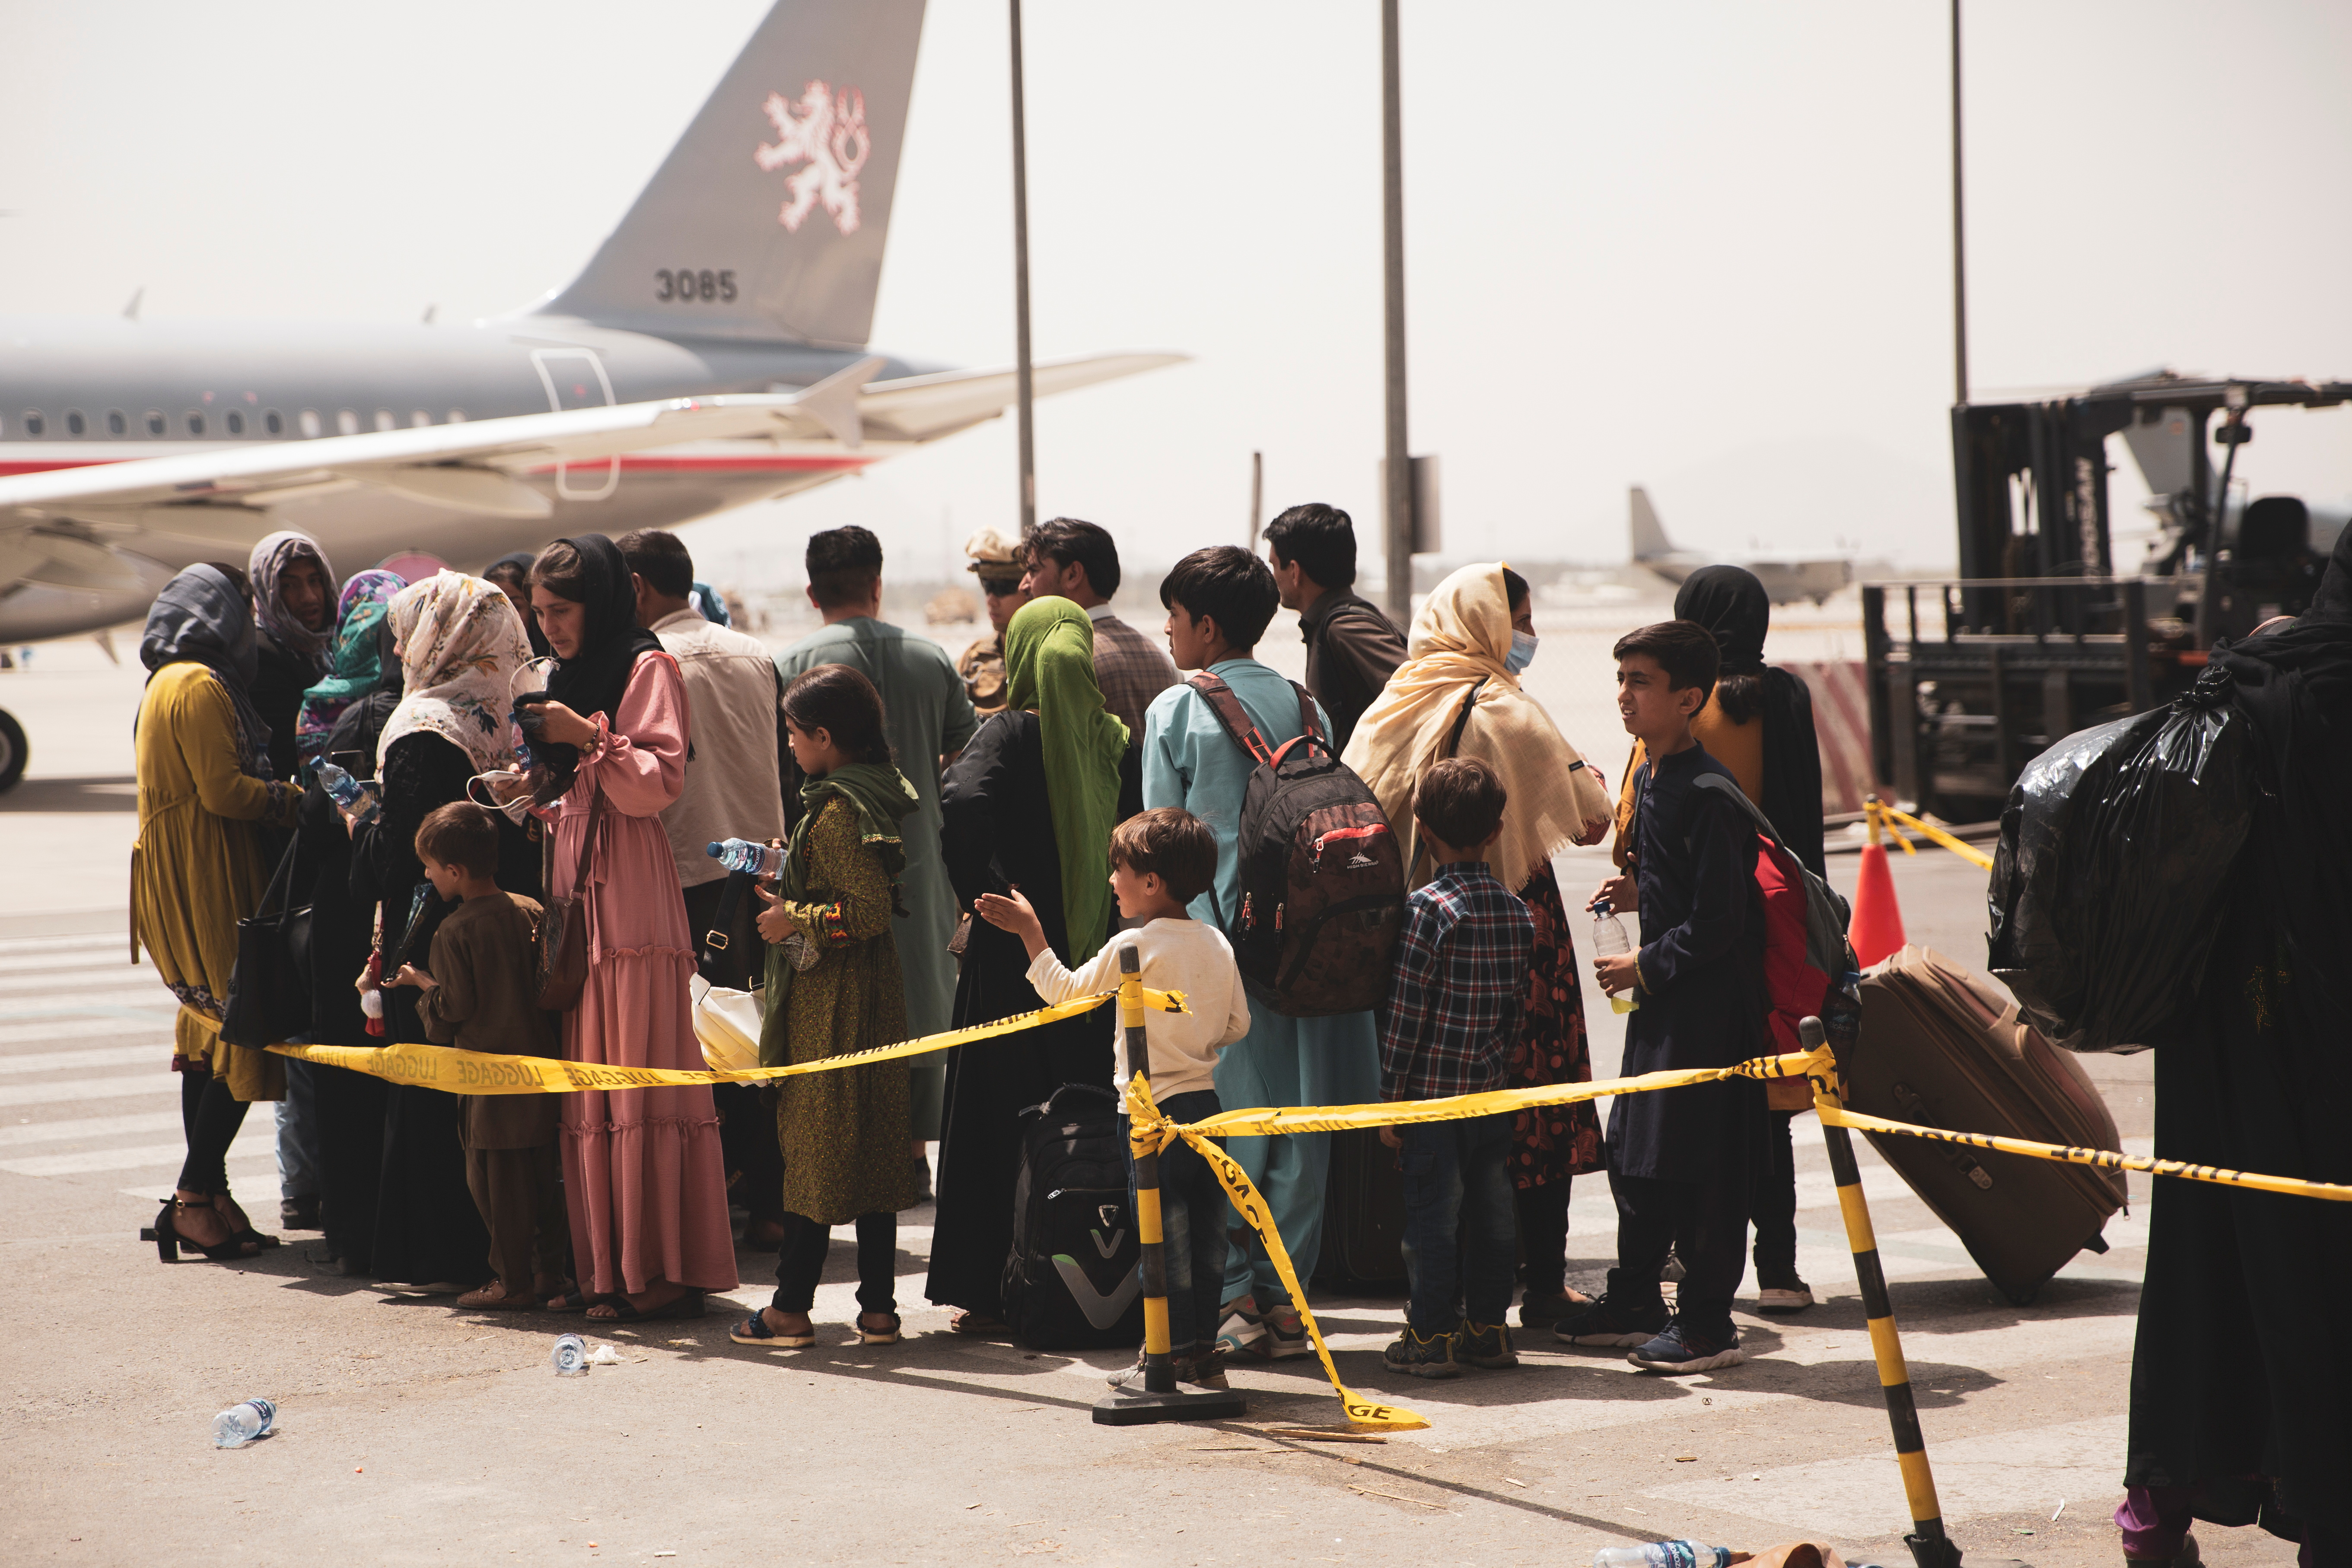 Civilians prepare to board a plane during an evacuation at Hamid Karzai International Airport, Kabul, Afghanistan August 18, 2021. U.S. Marine Corps/Staff Sgt. Victor Mancilla/Handout via REUTERS